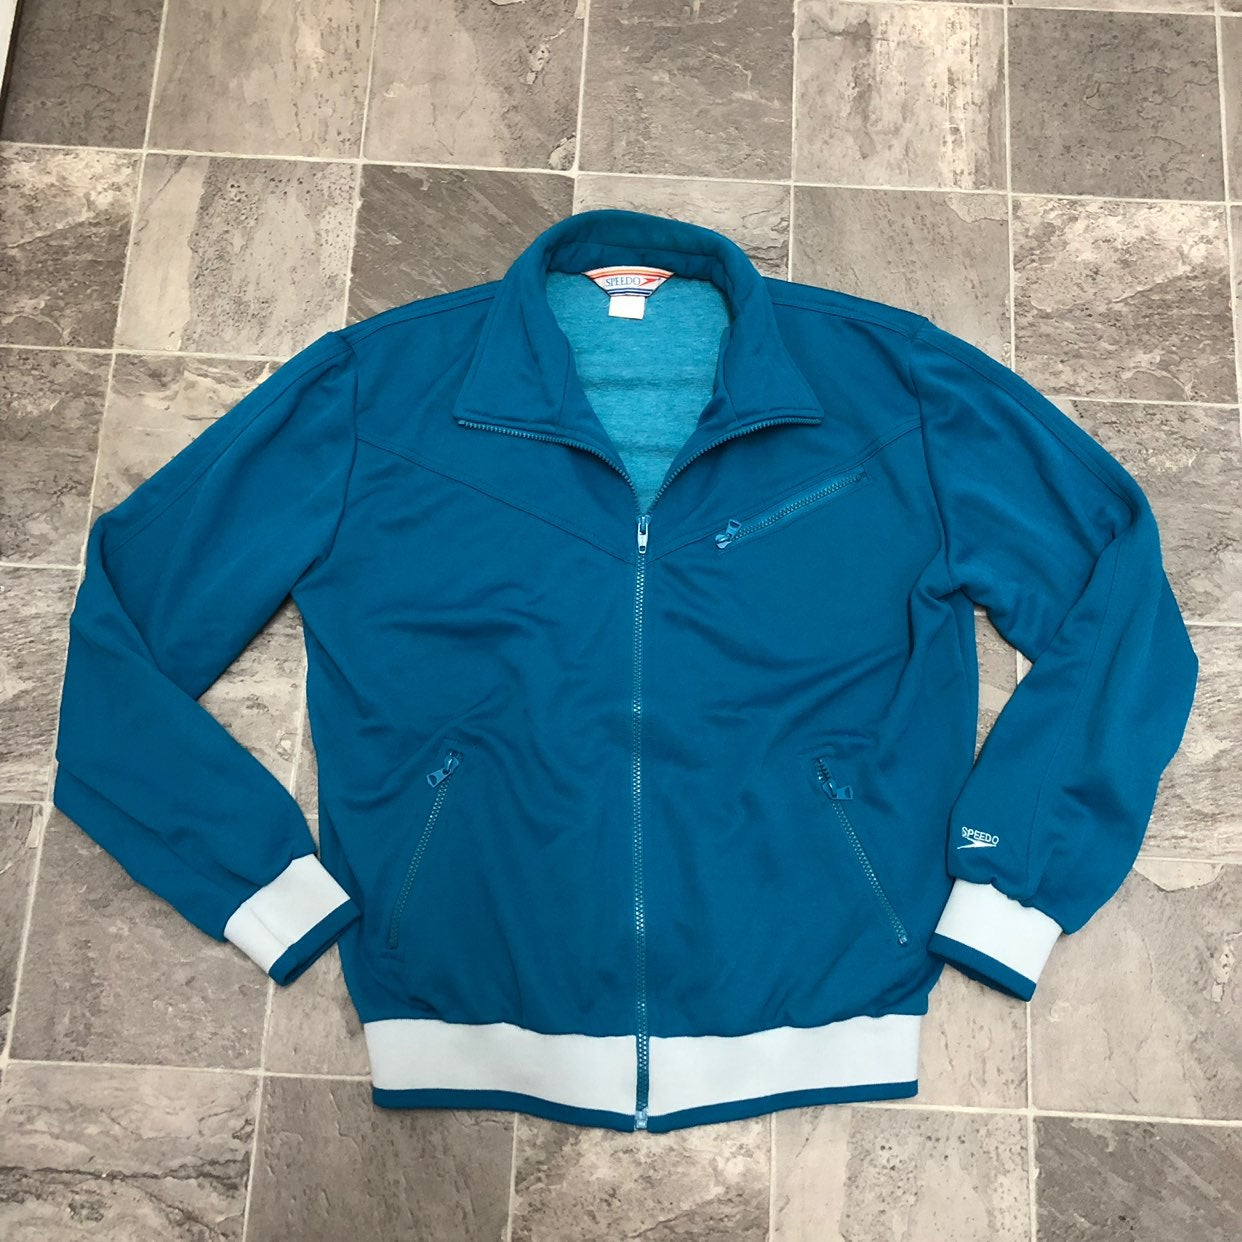 Men's Vintage 80s Speedo Track Jacket